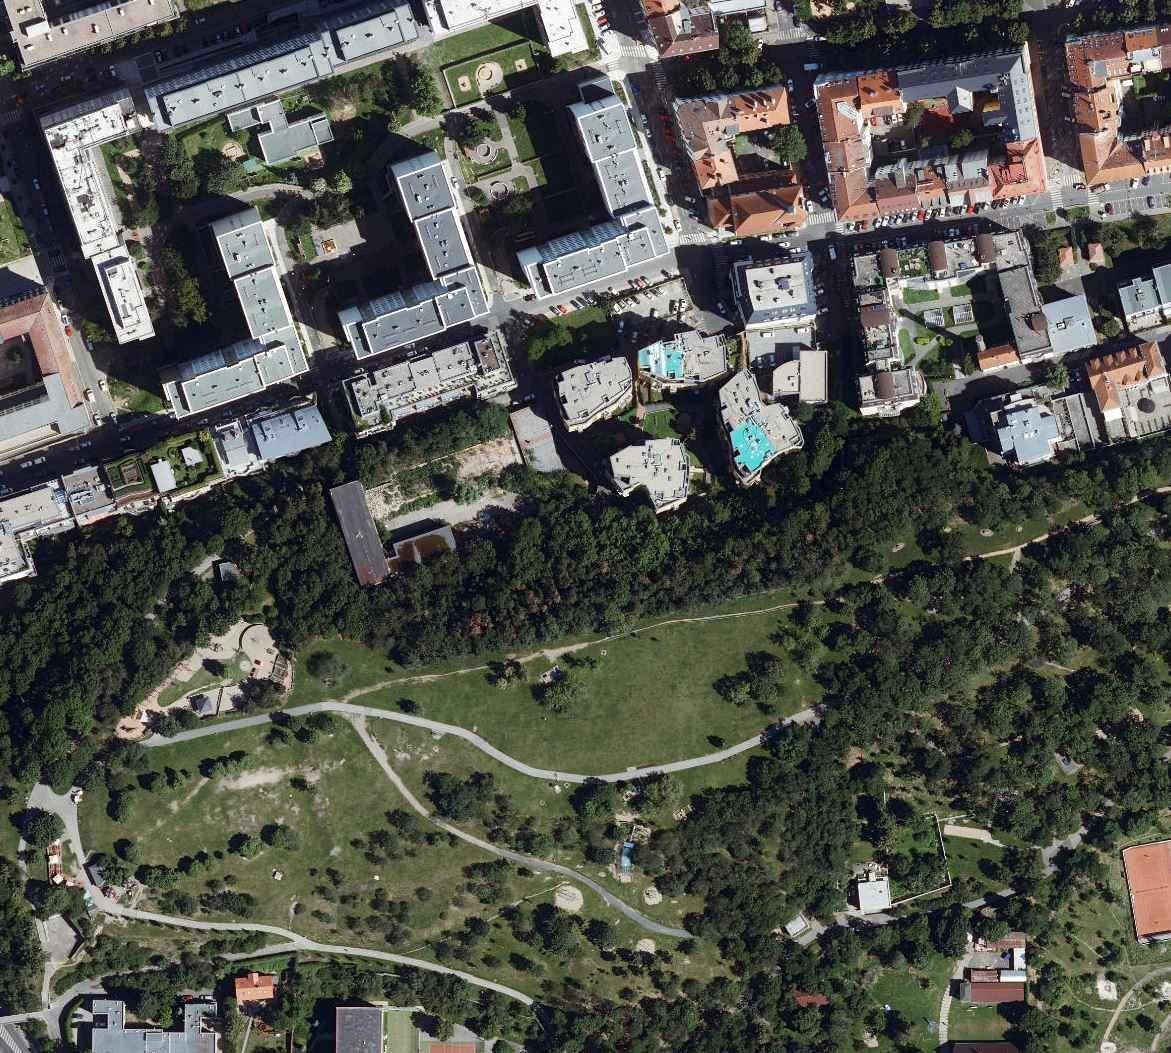 nouzova-kolonie-u-kapslovny-letecky-snimek-2020